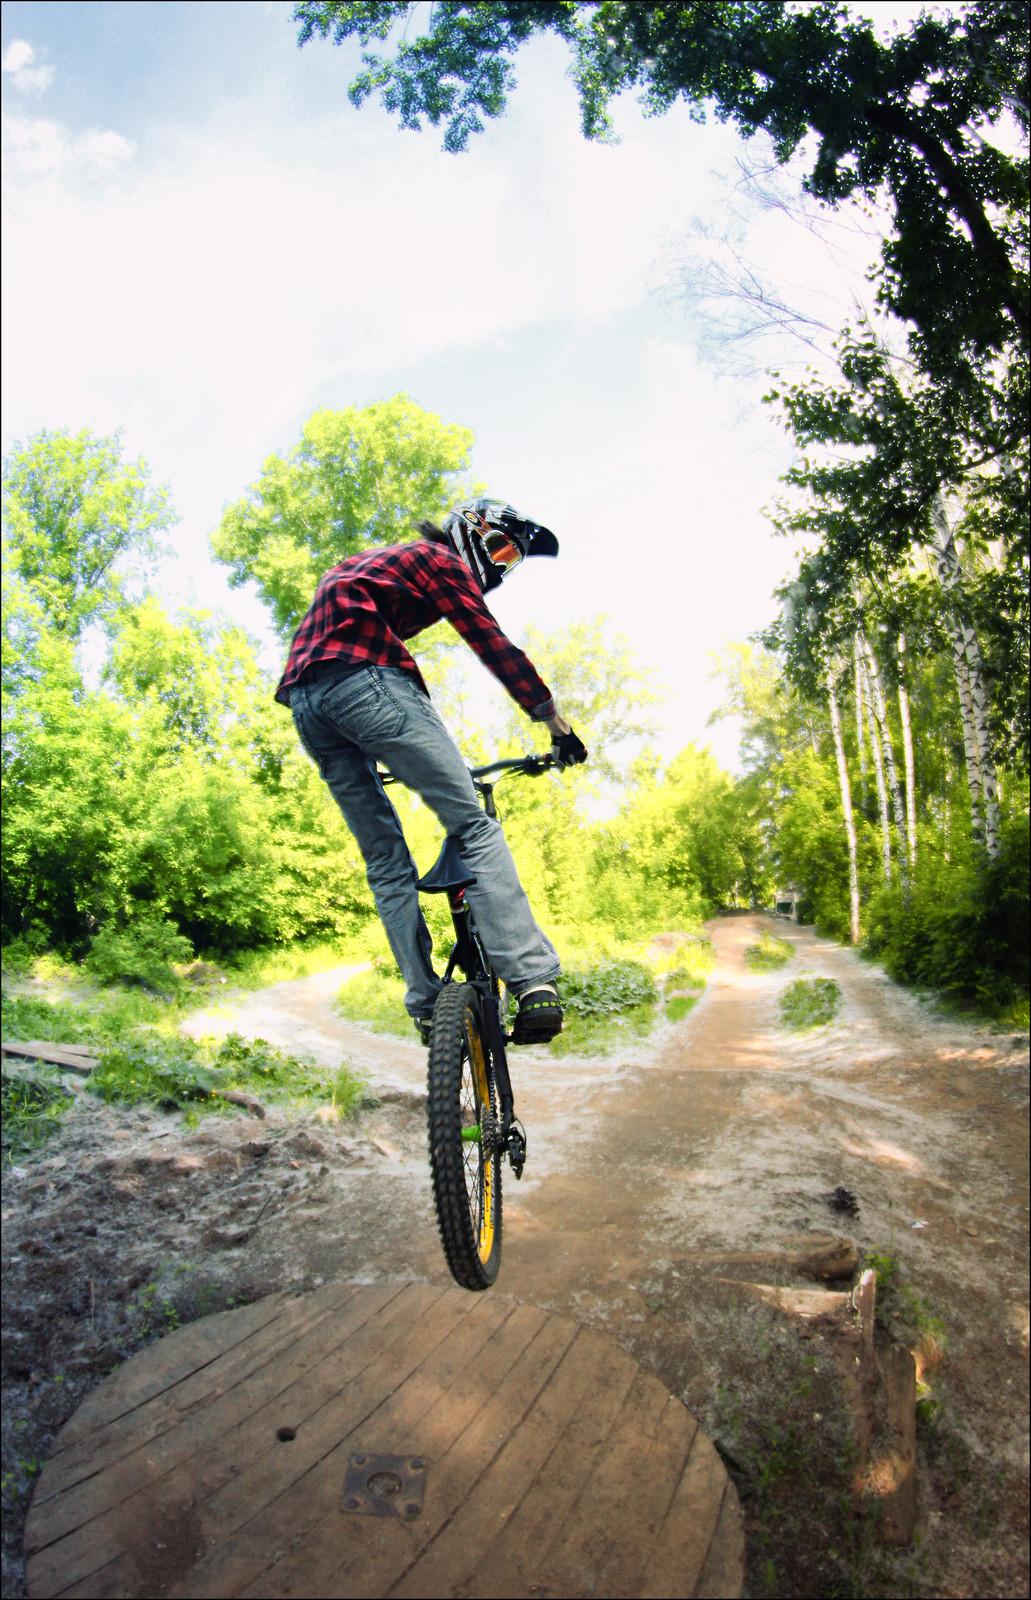 IMG 6005 - YakuT - Mountain Biking Pictures - Vital MTB